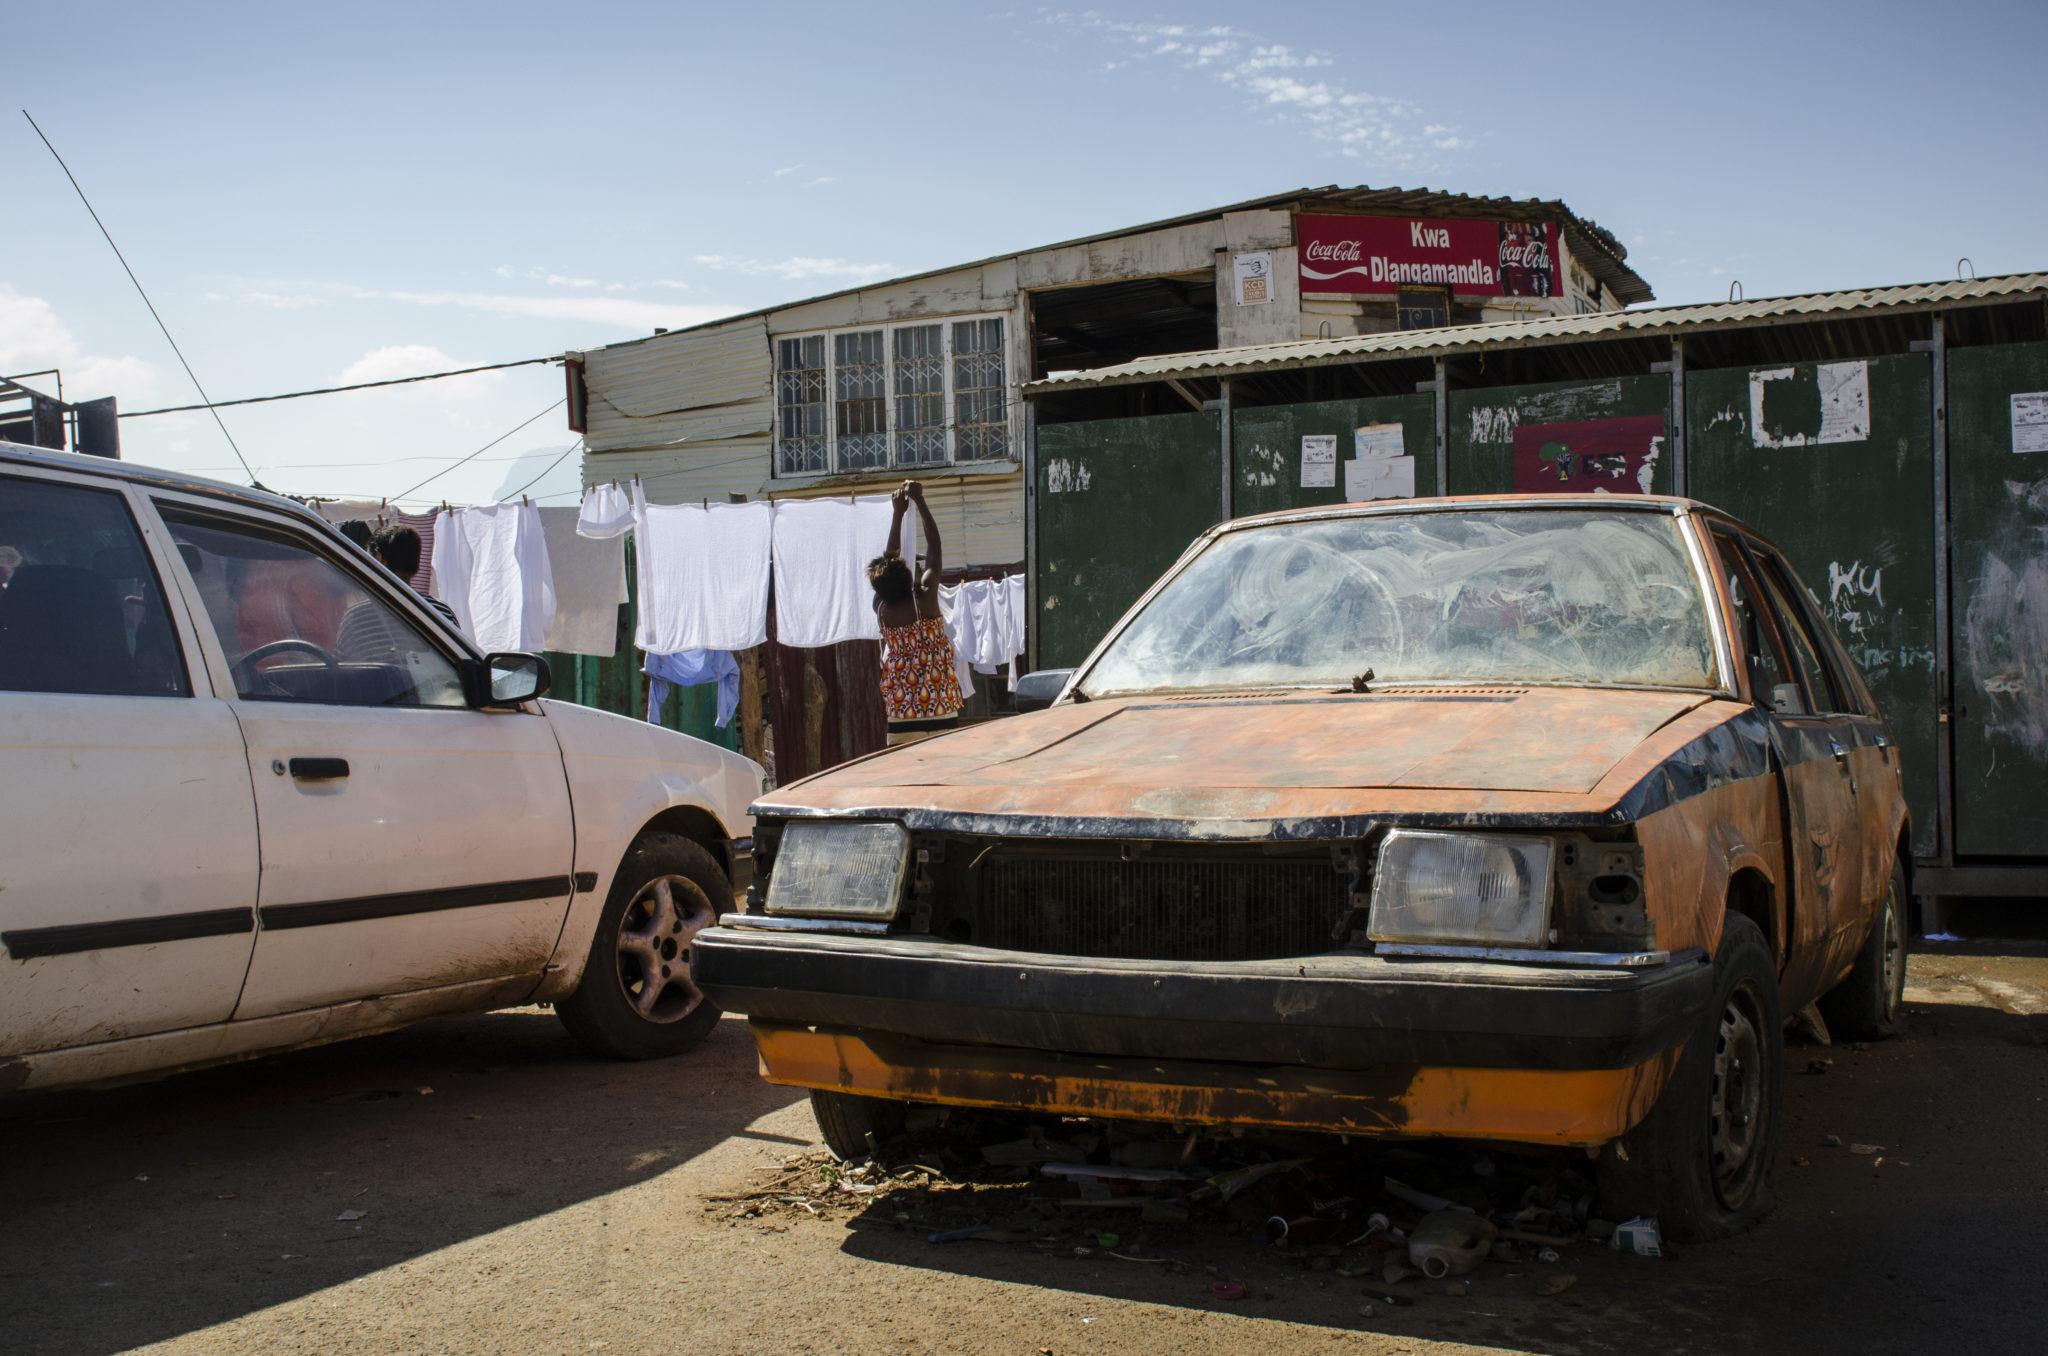 Ein altes Auto in Kayamandi